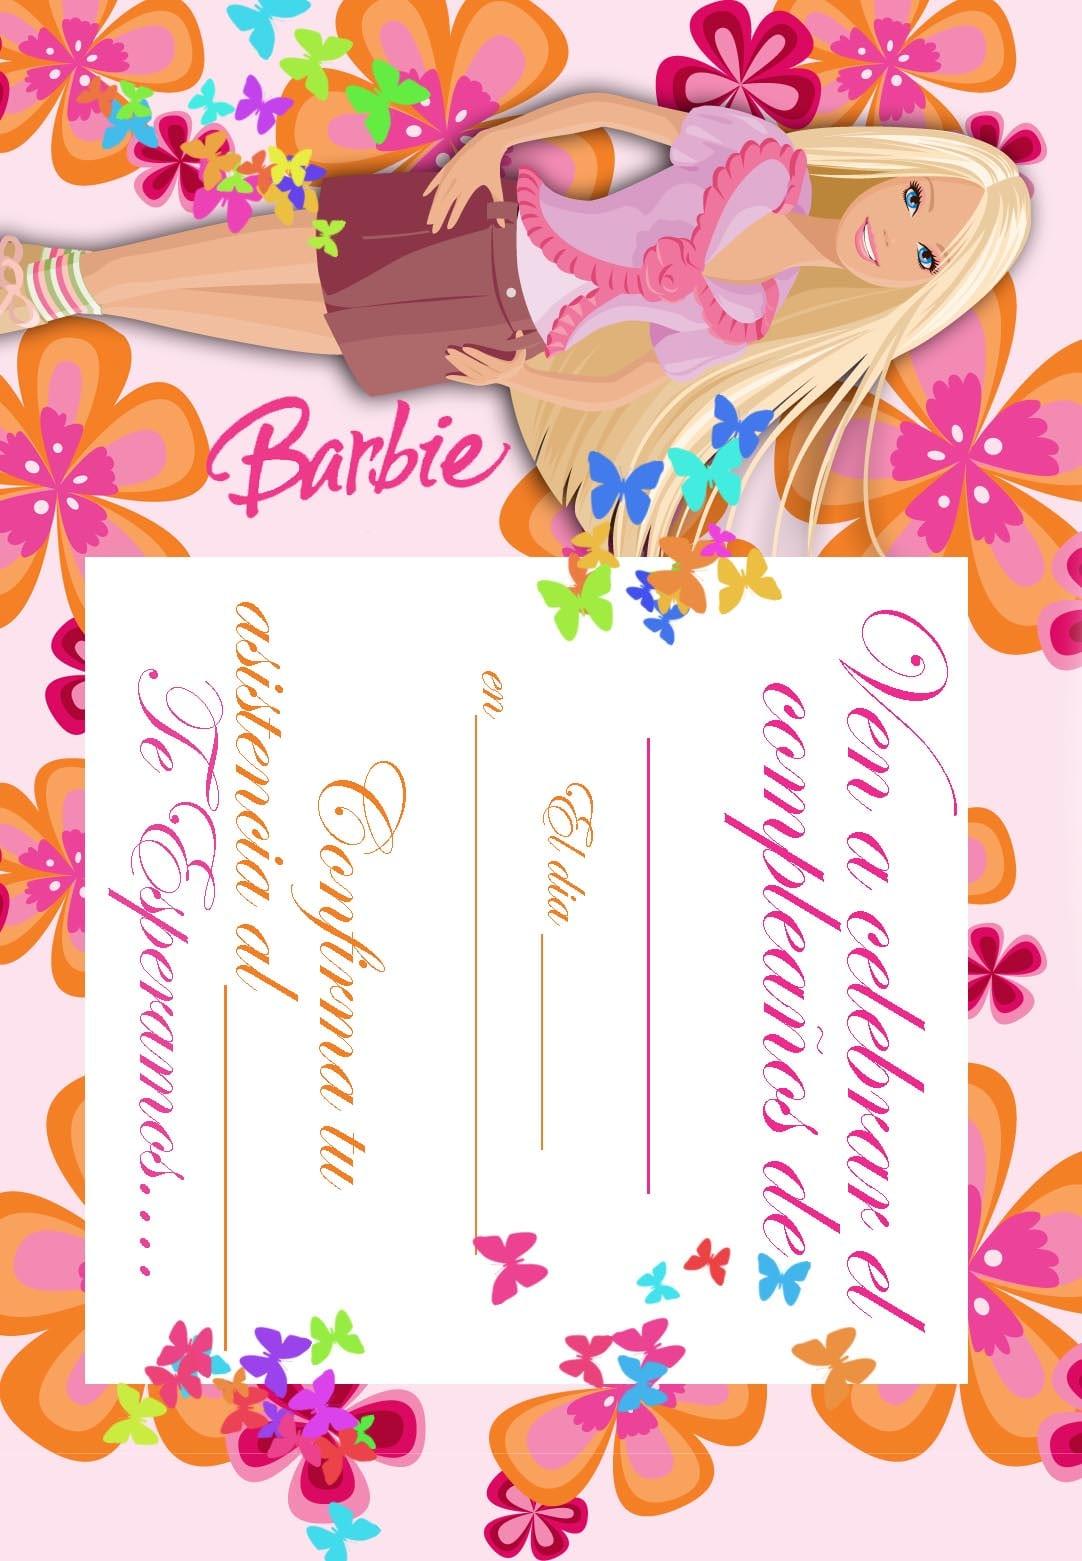 Spanish Party Invitations - Mickey Mouse Invitations Templates